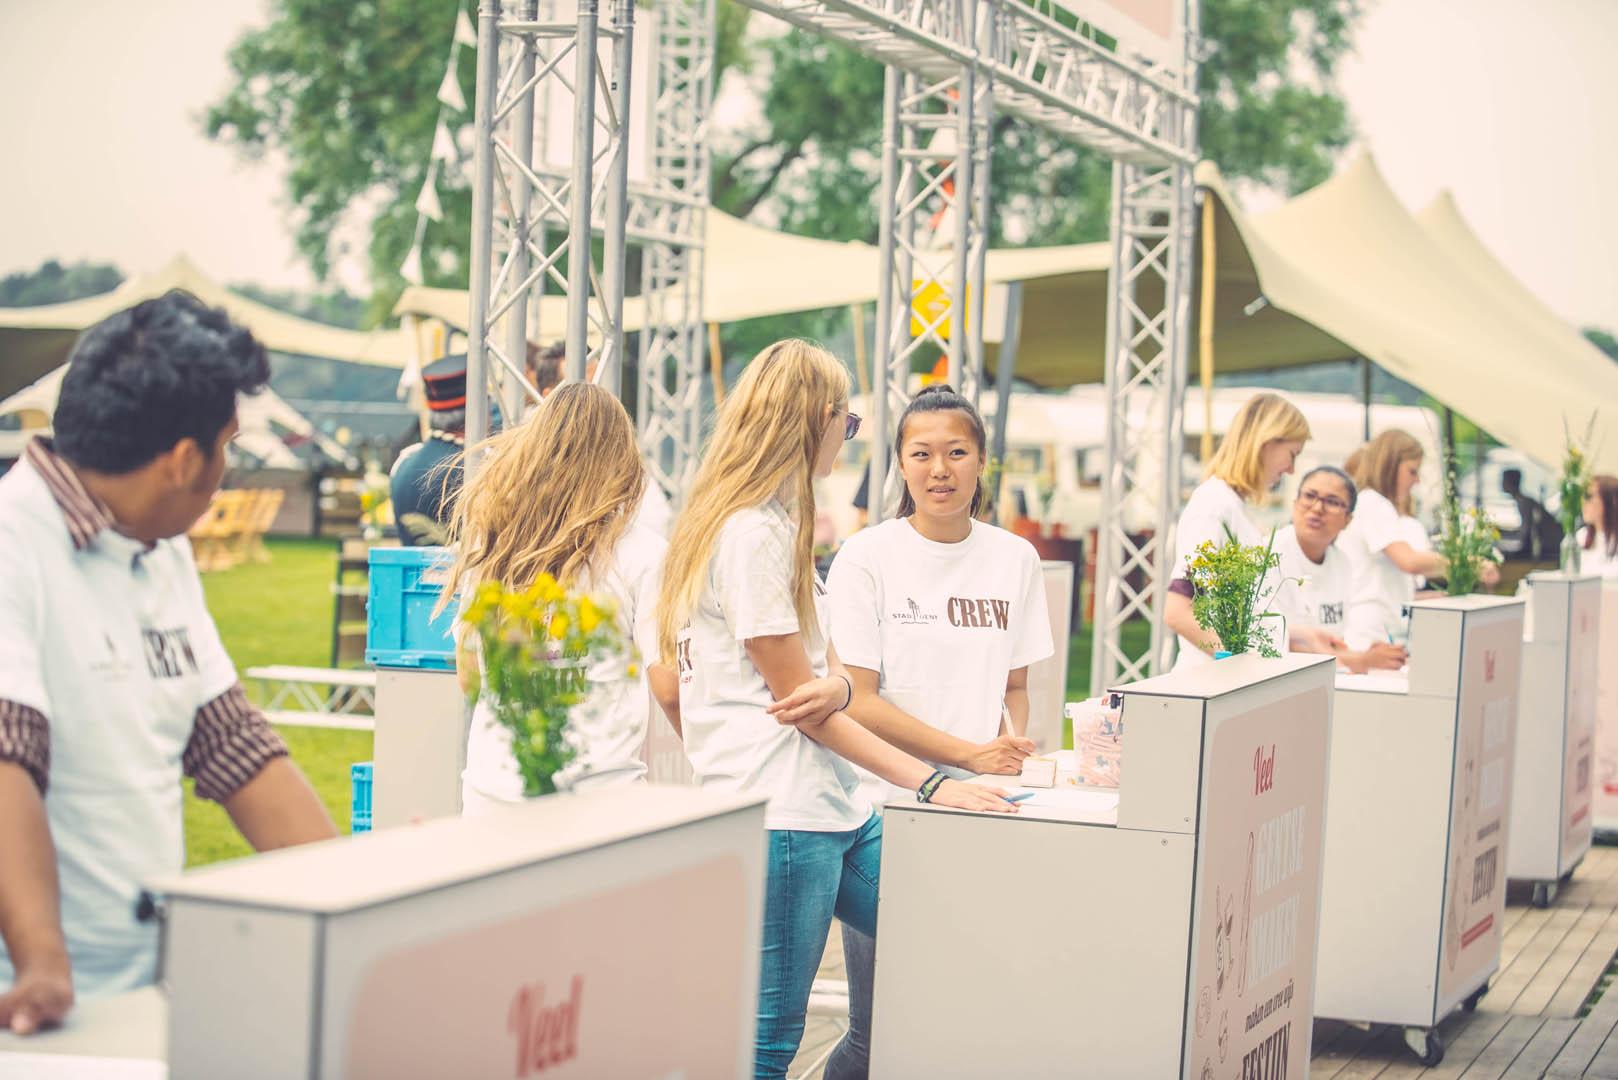 Stad Gent Picknick Event Crew